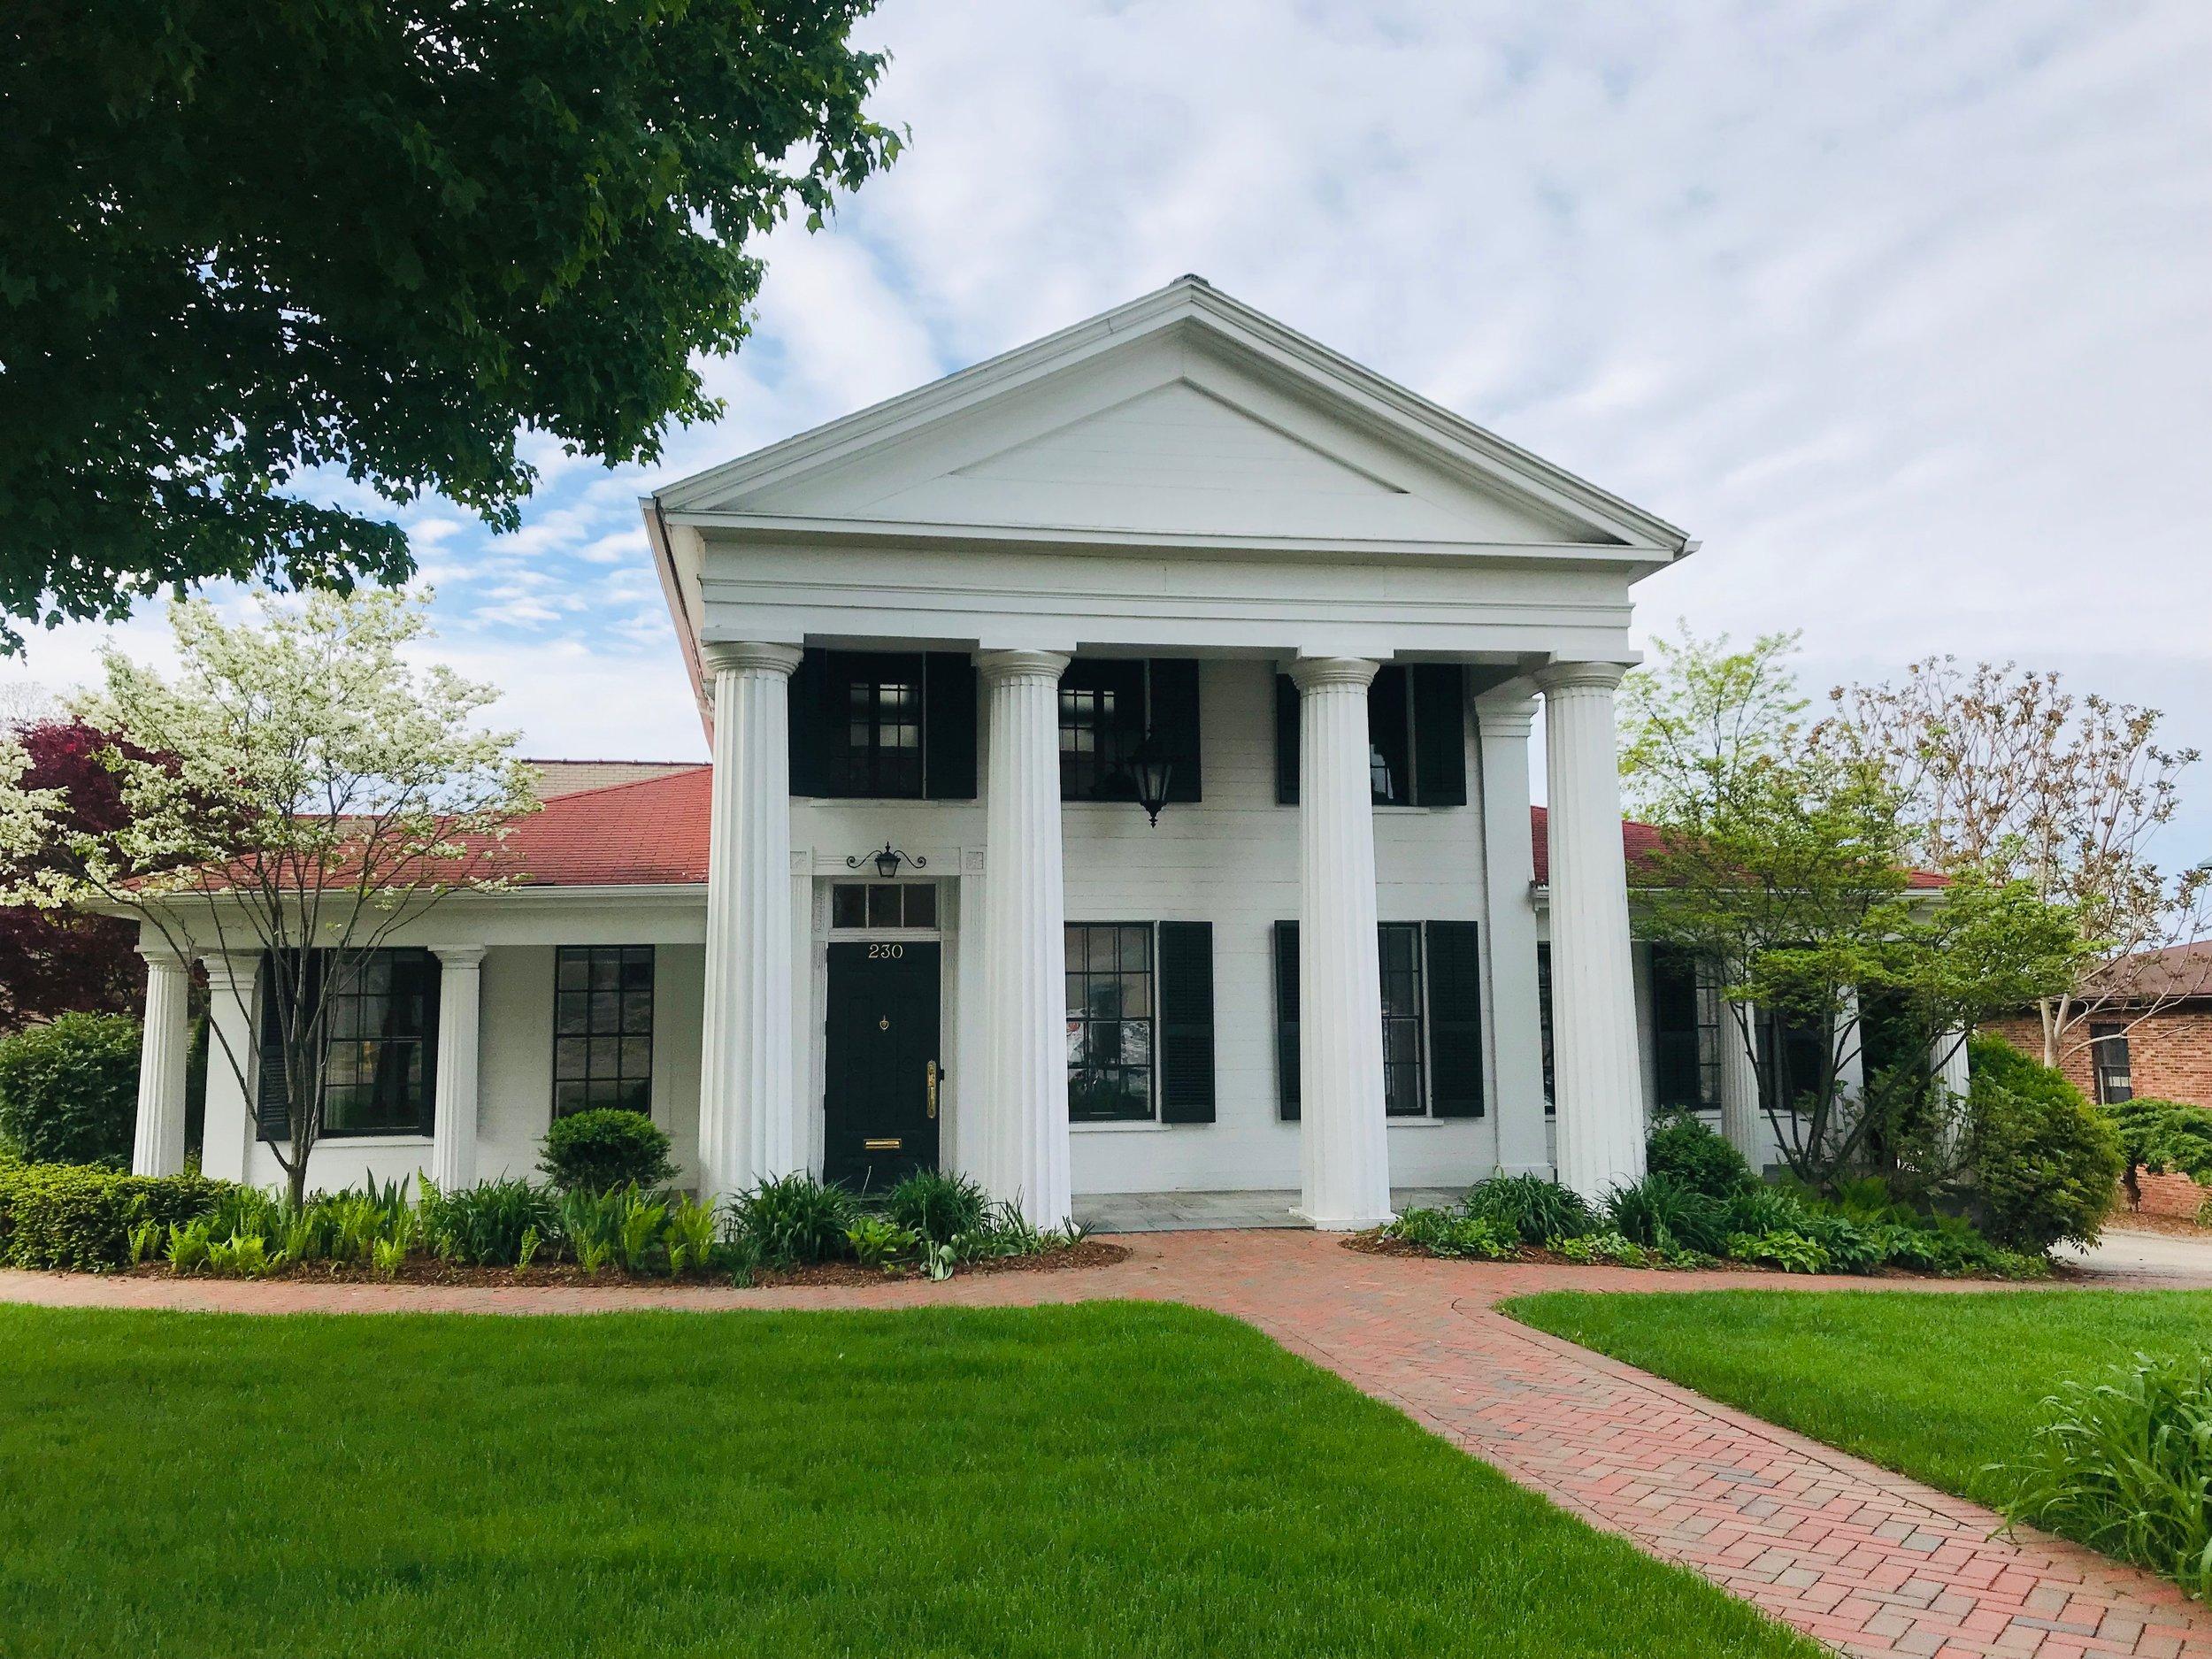 ABRAM PIKE HOUSE